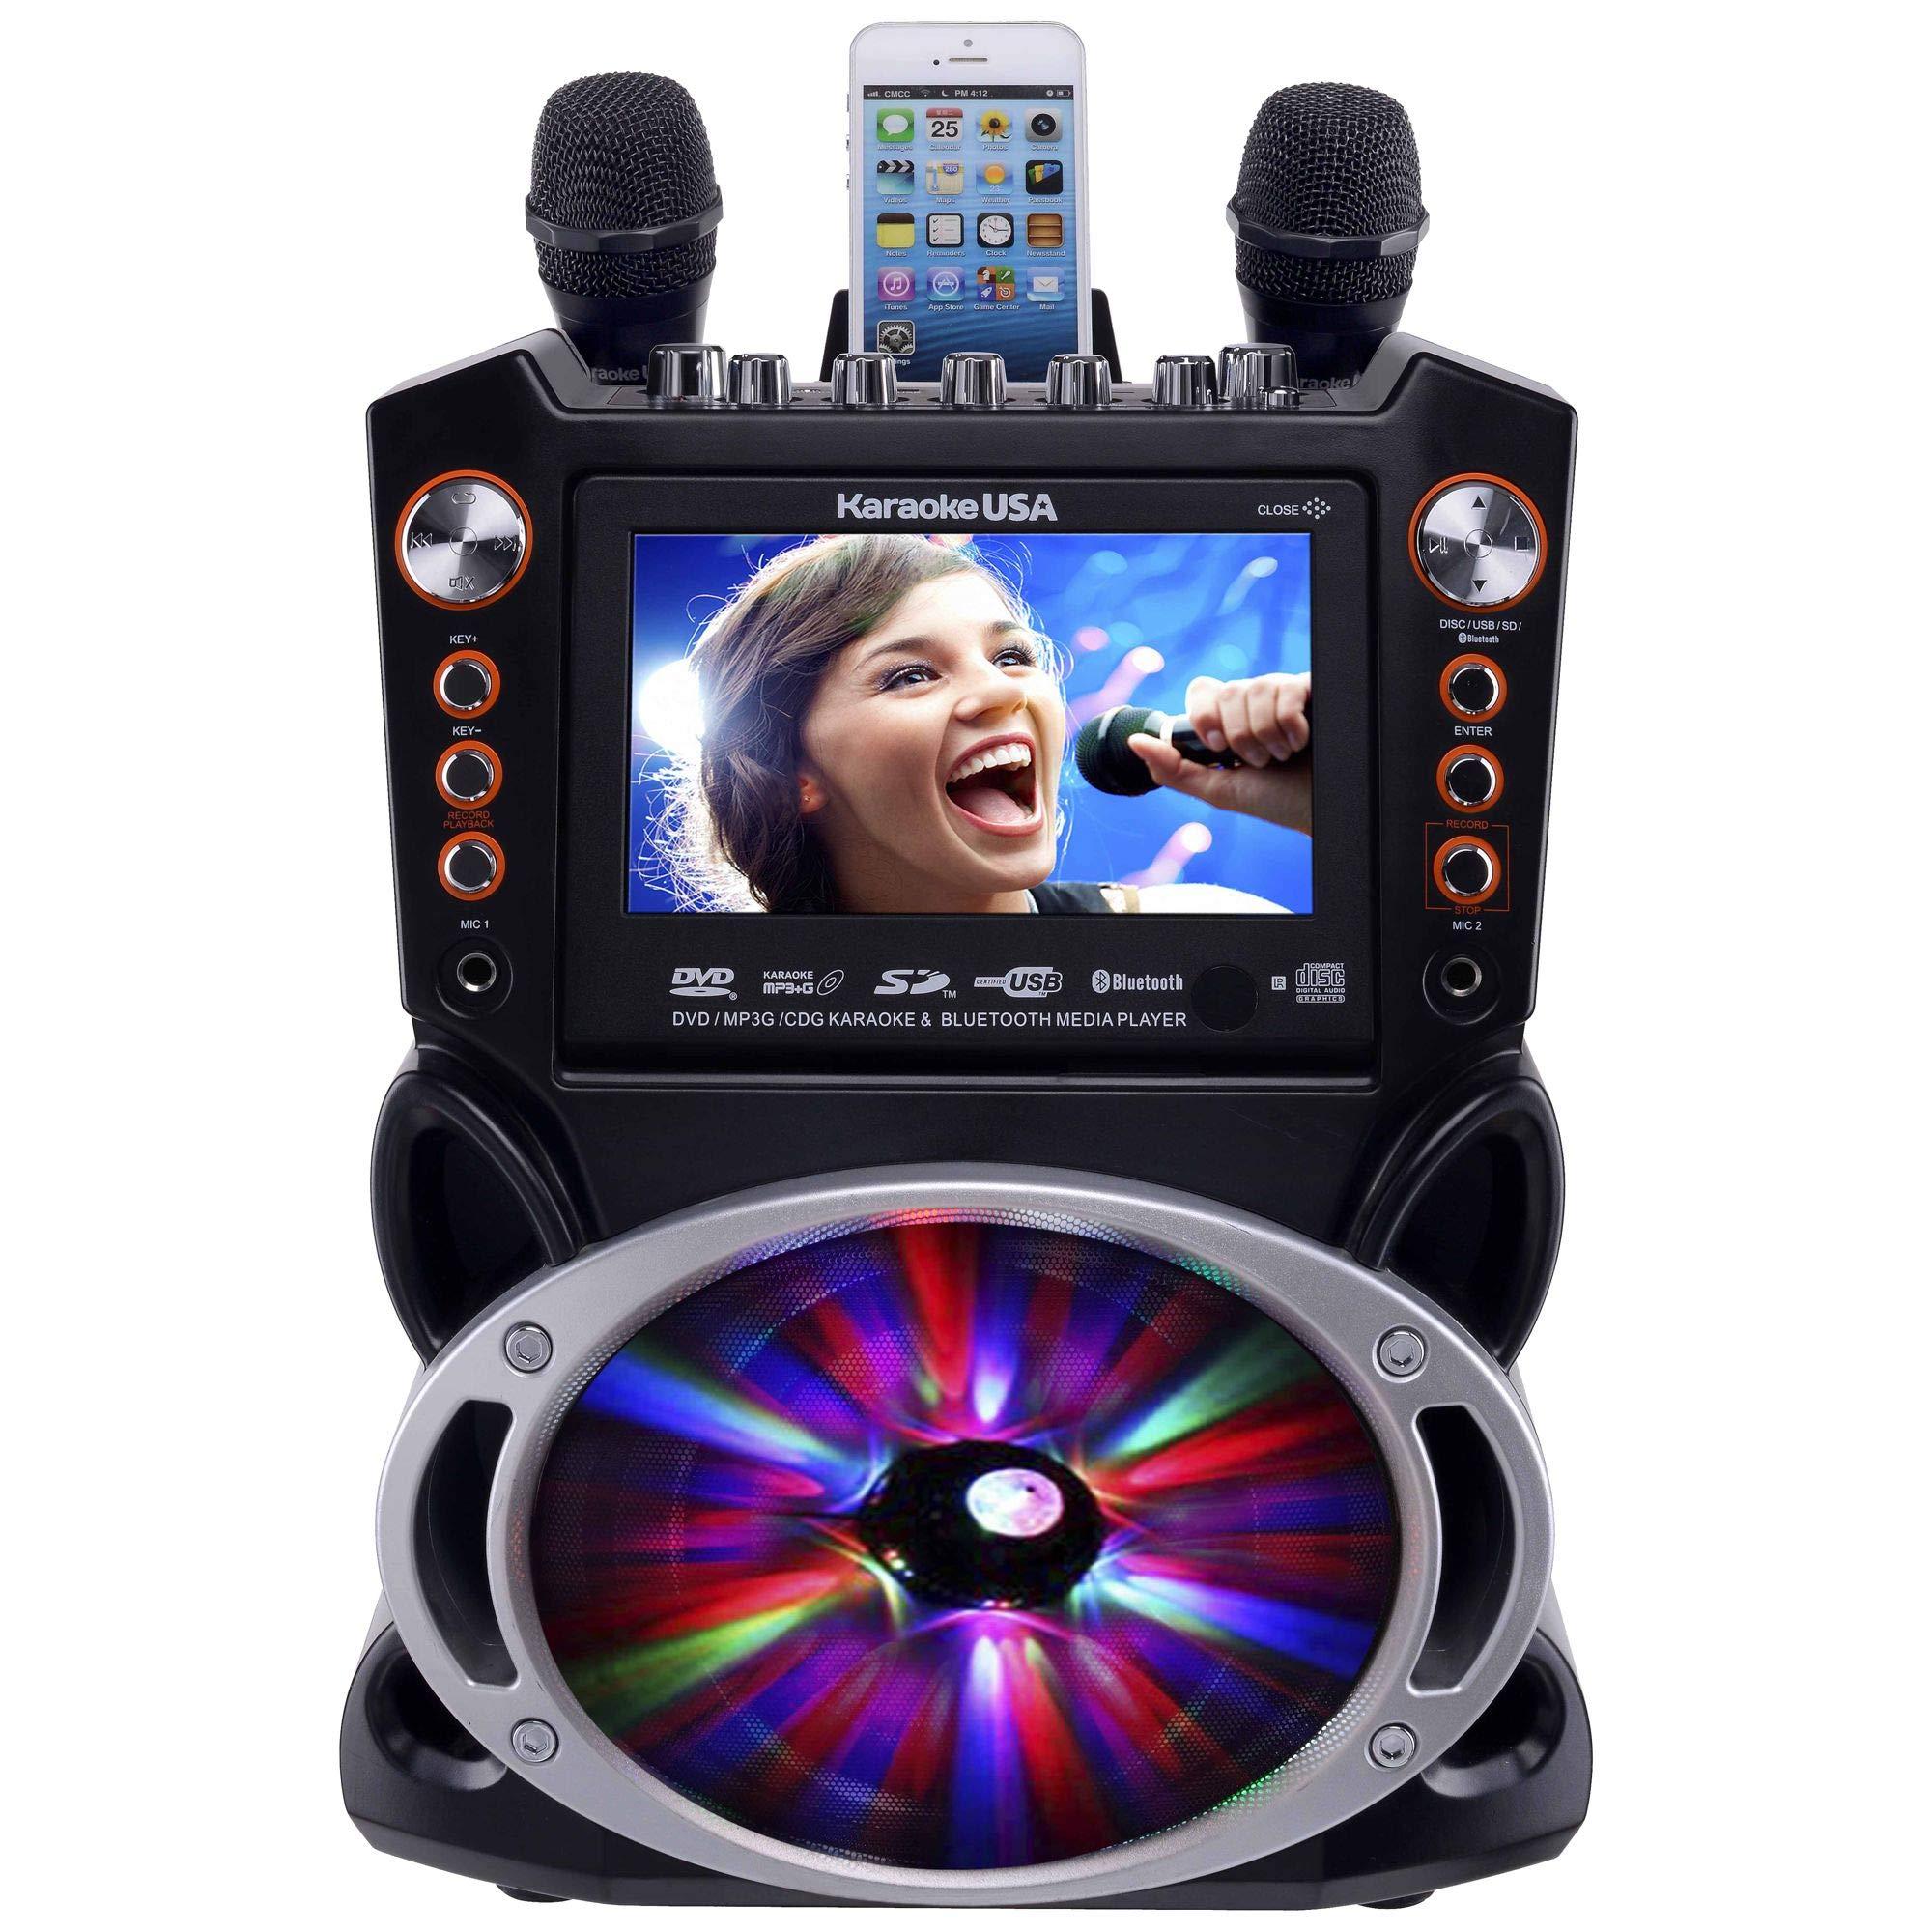 Karaoke USA GF846 Machine Bluetooth